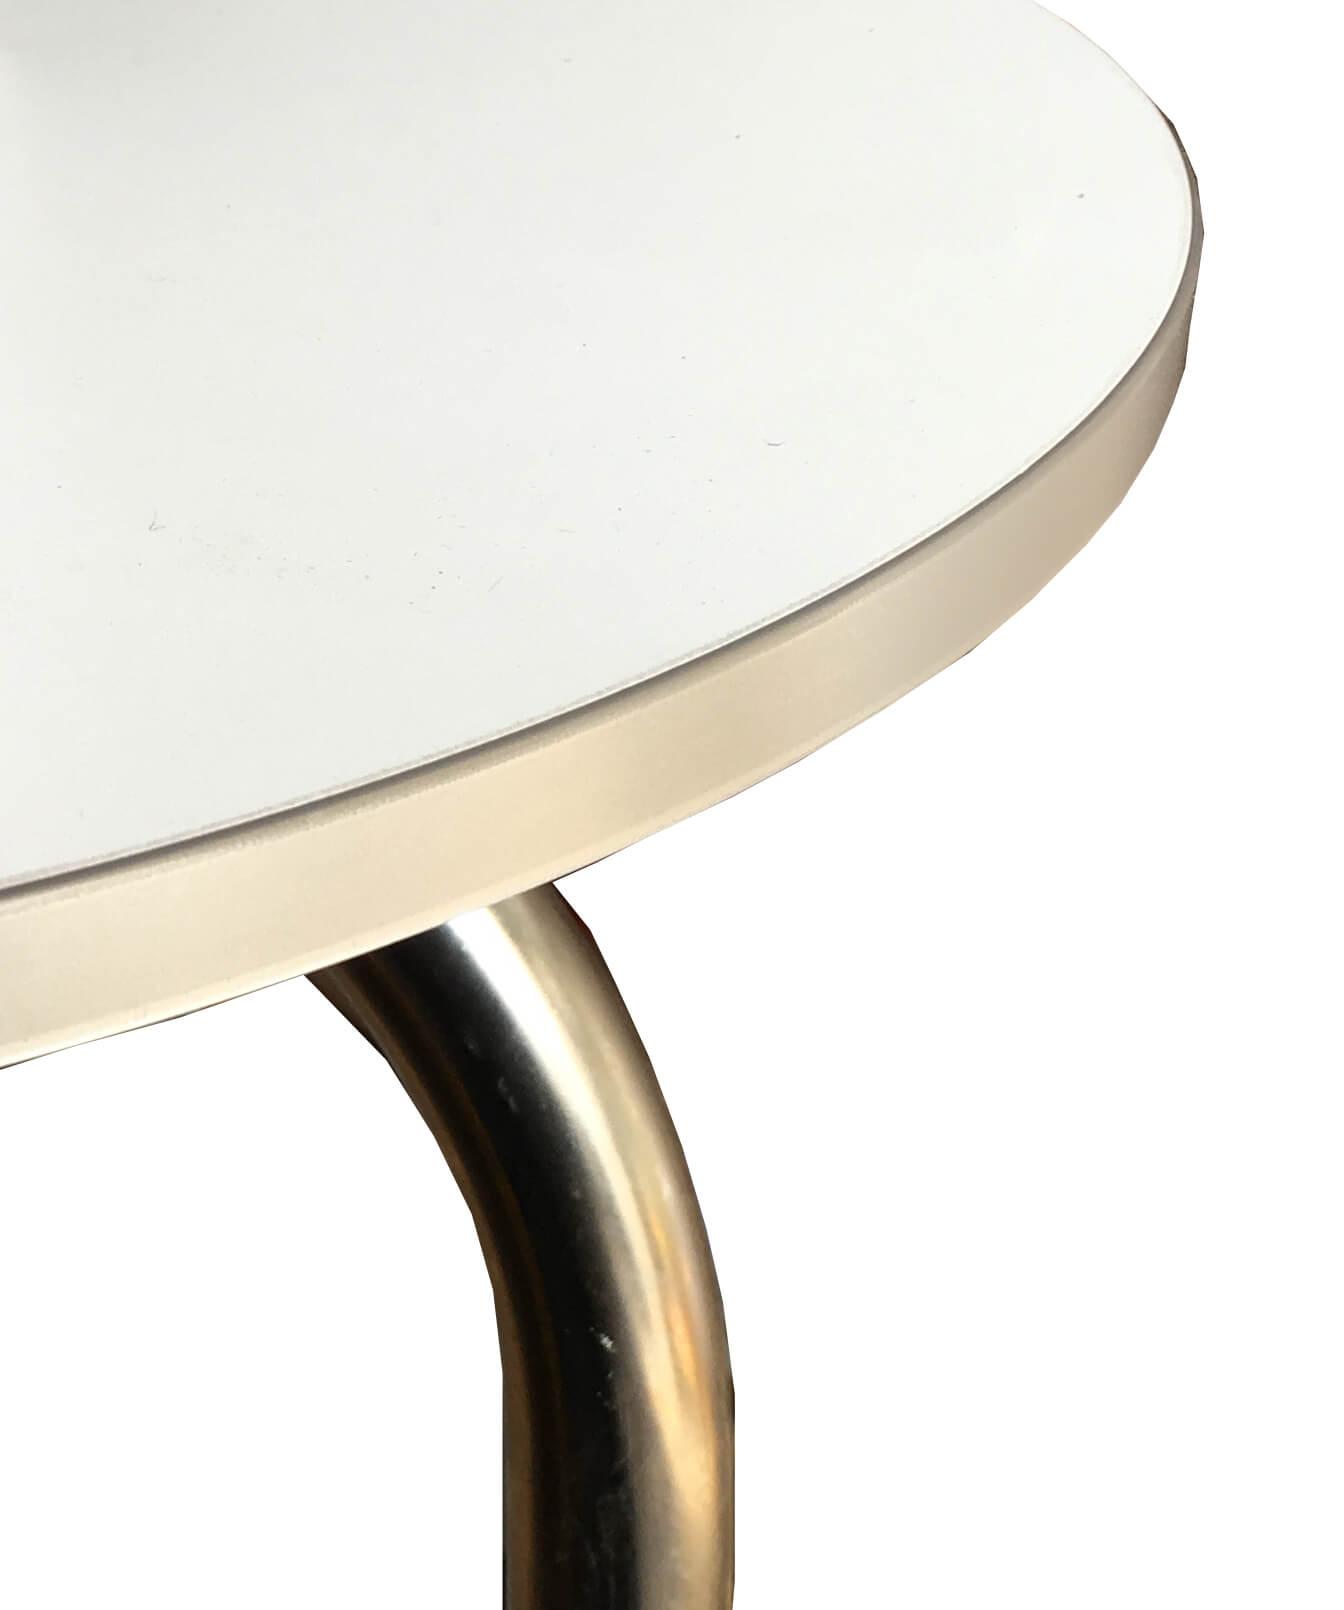 Ikea grimle esstisch 180x95cm wei grau chrom 220143541 for Esstisch grau weiss